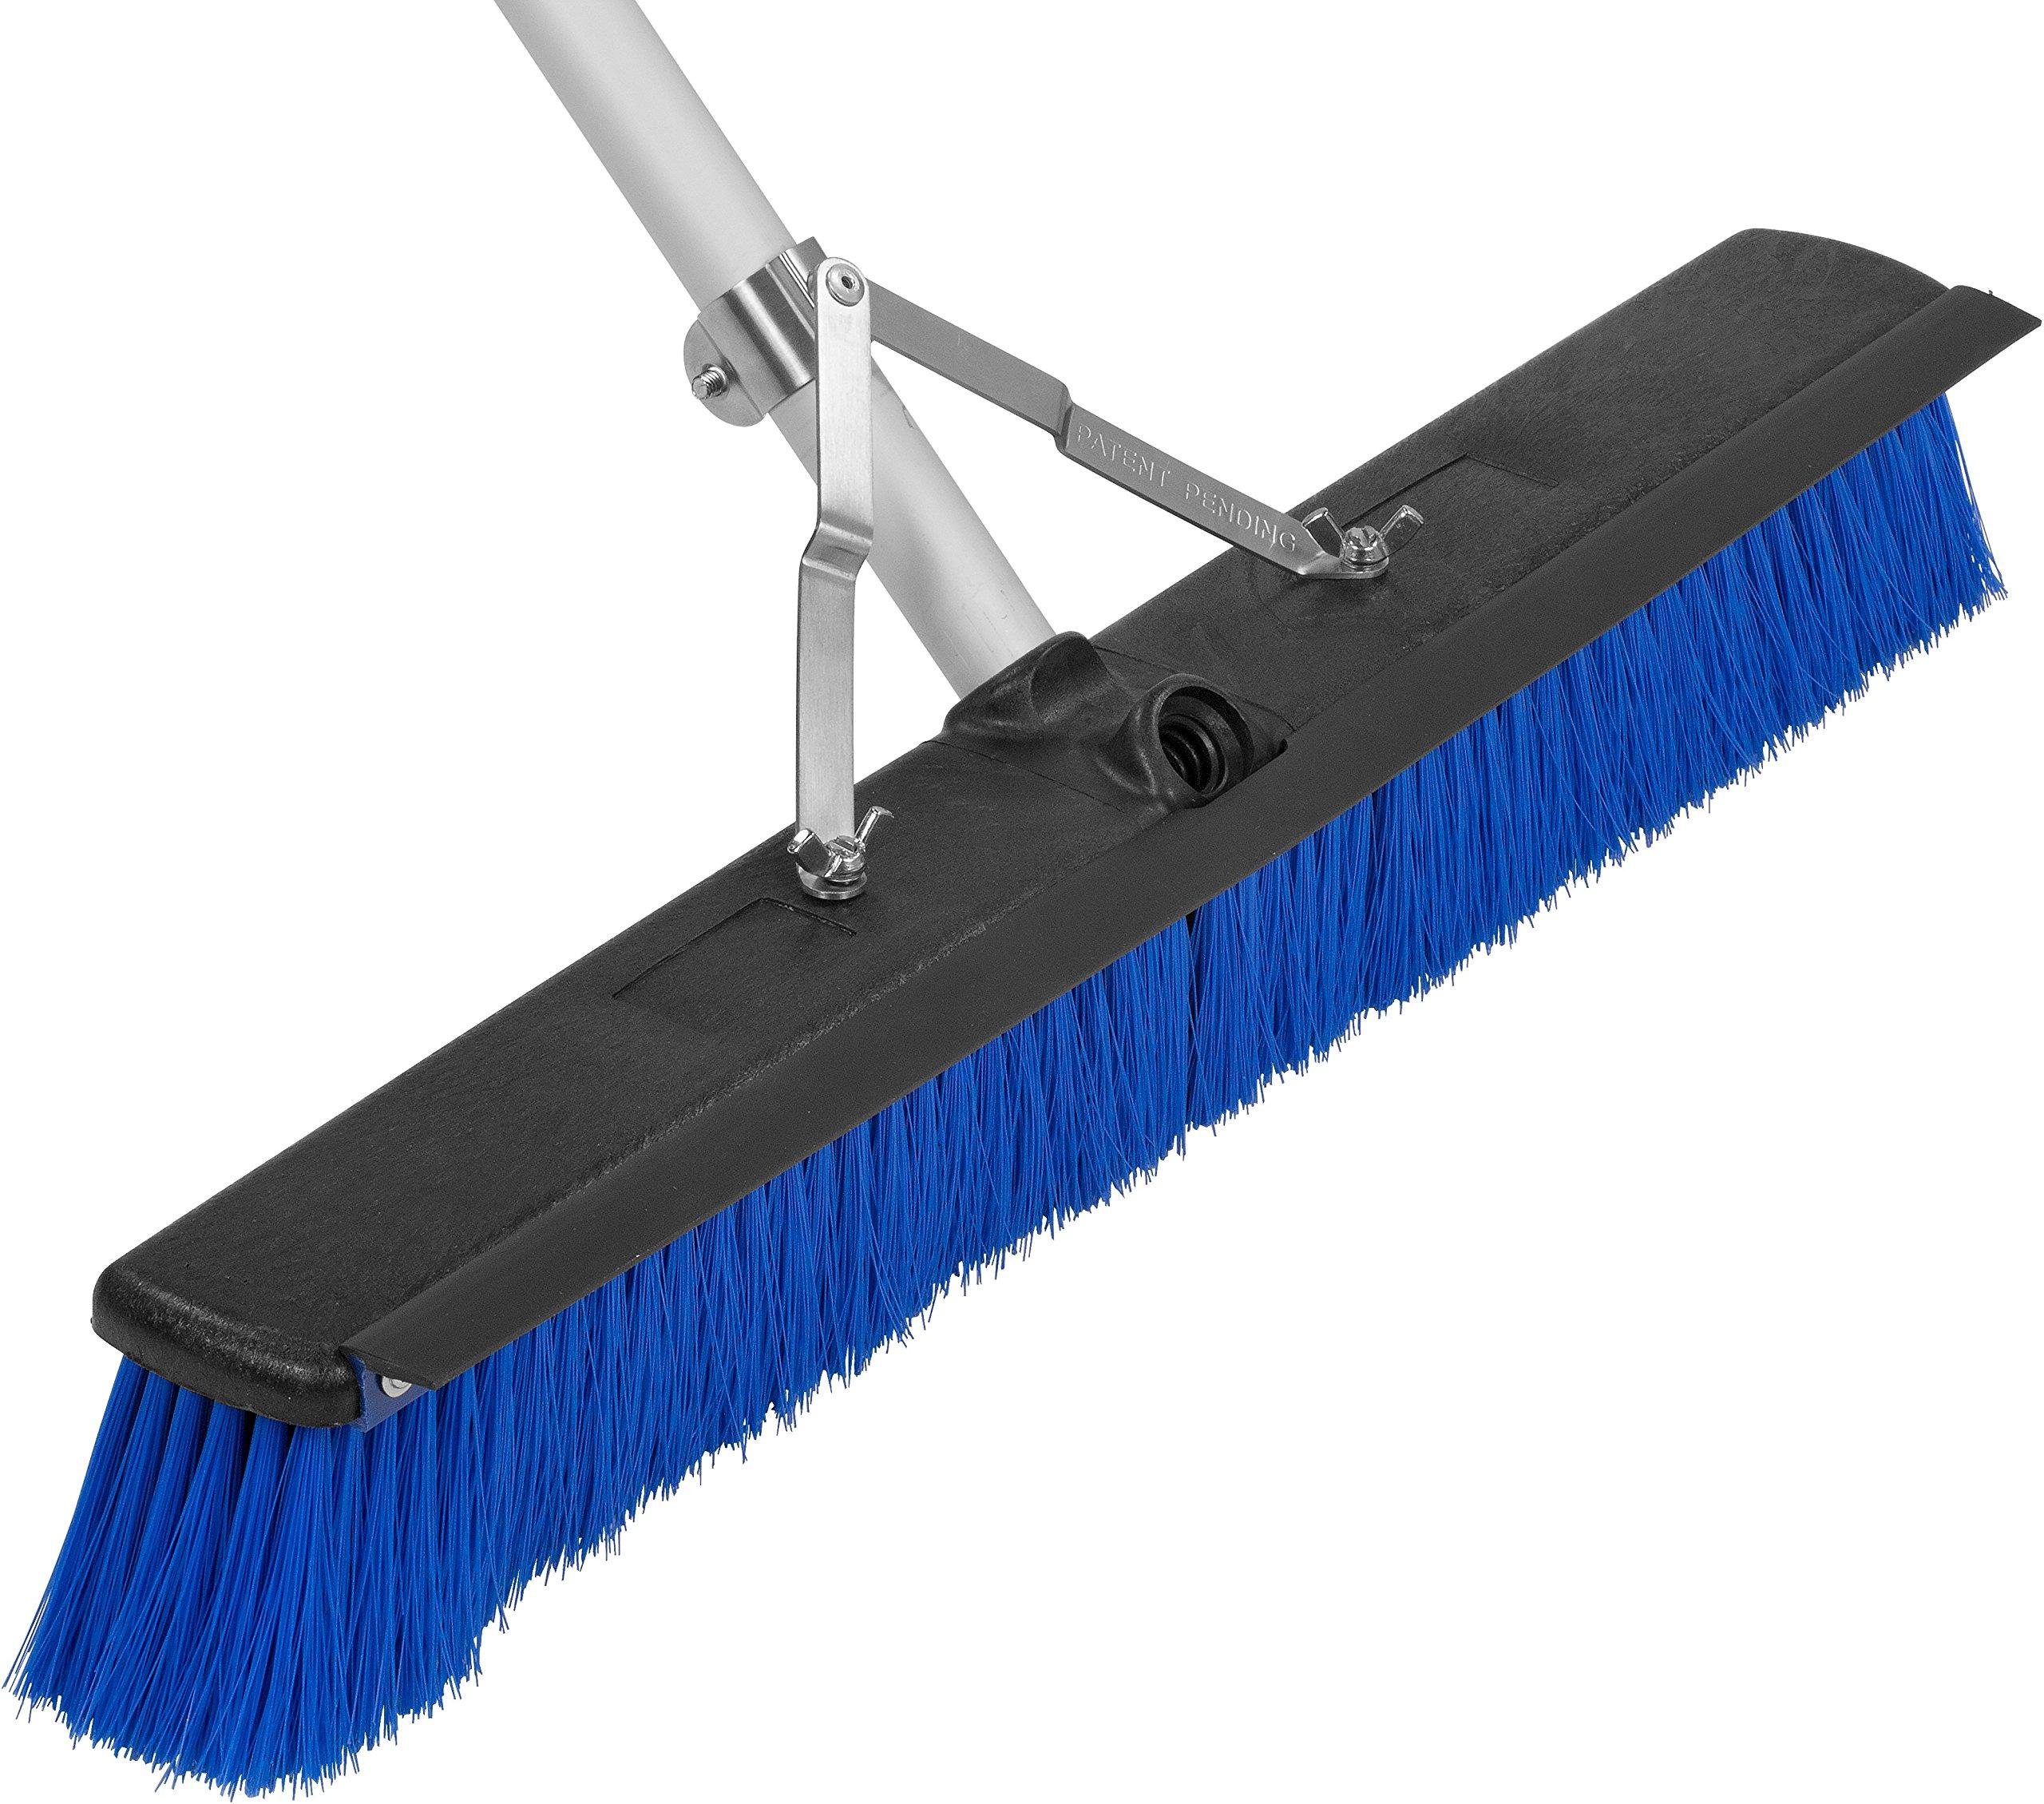 Carlisle 3621962414 Sweep Complete Aluminum Handle Floor Sweep with Squeegee, Plastic Bristles, 24'' Length, 3'' Bristle Trim, Blue (Case of 6)